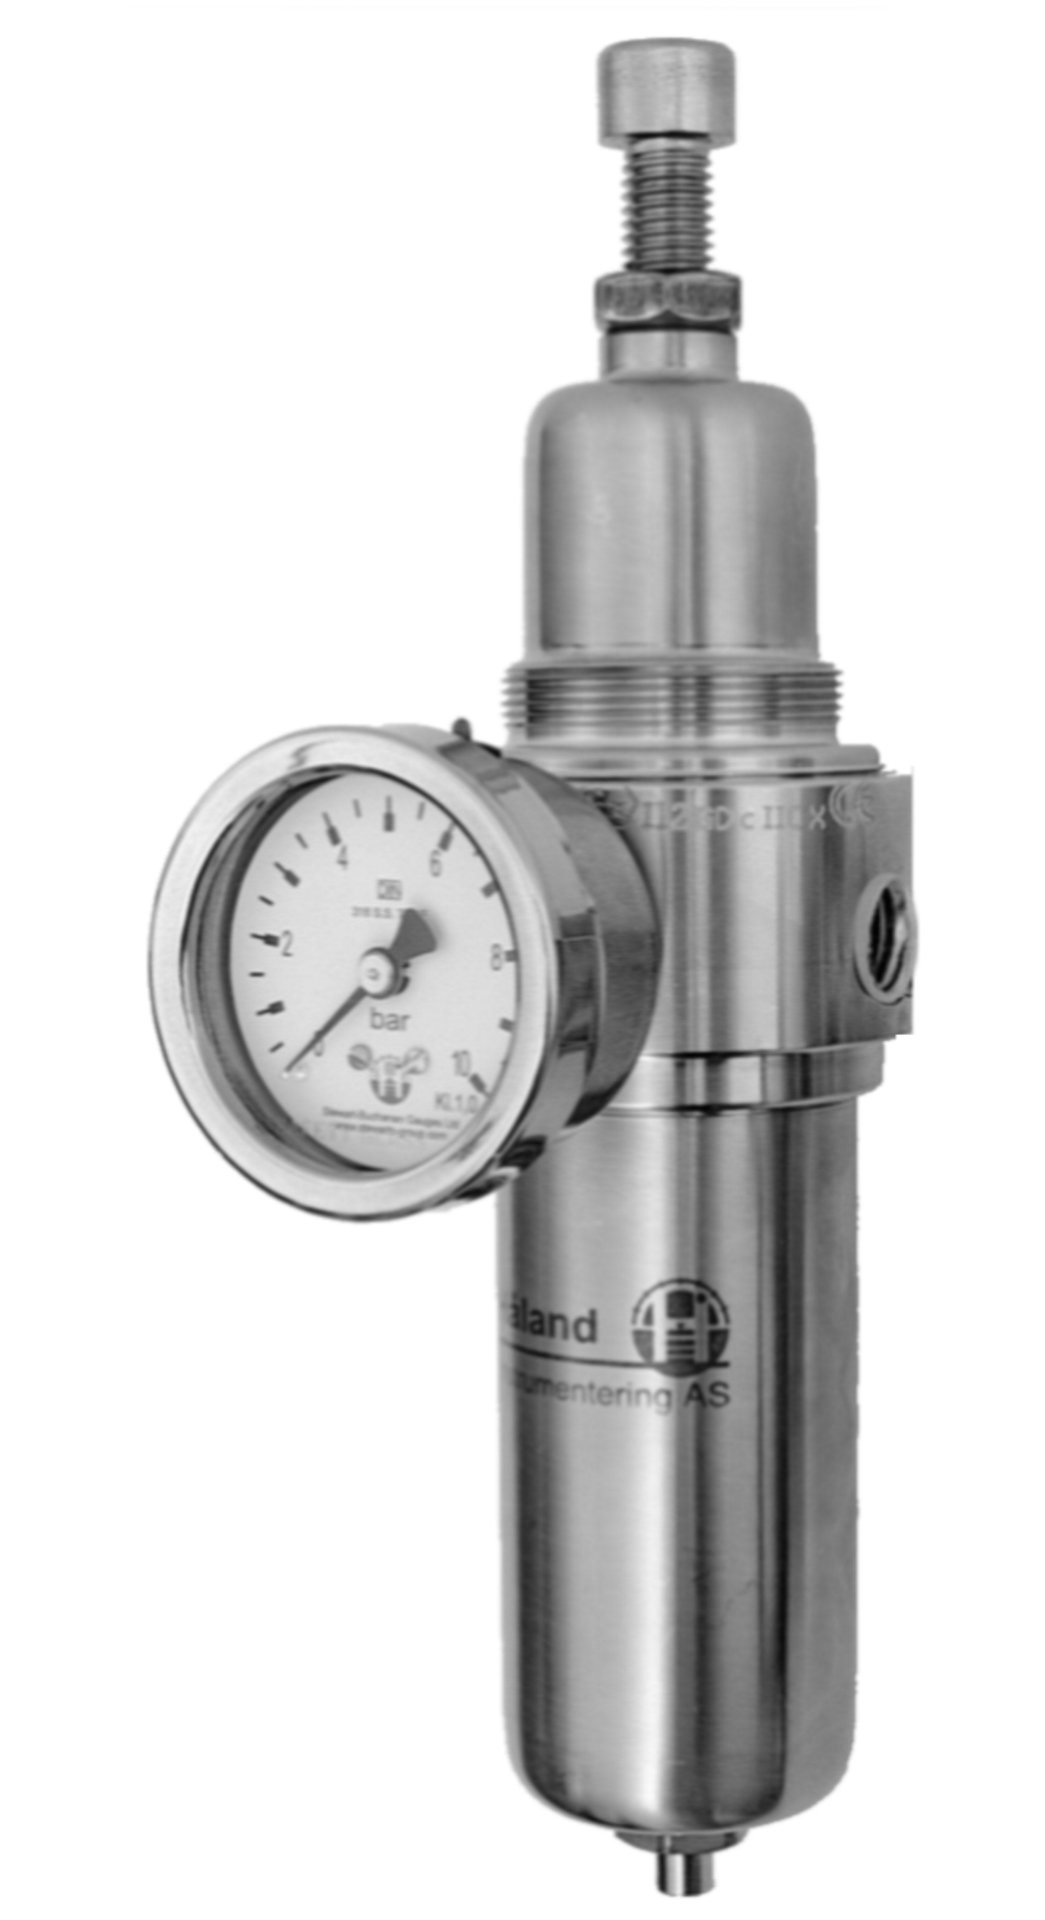 Luftregulator Gassregulator Luft filter regulator med manometer pneumatikk 316SS rustfri 0,25in Insert Deal forhandler distributør Norge